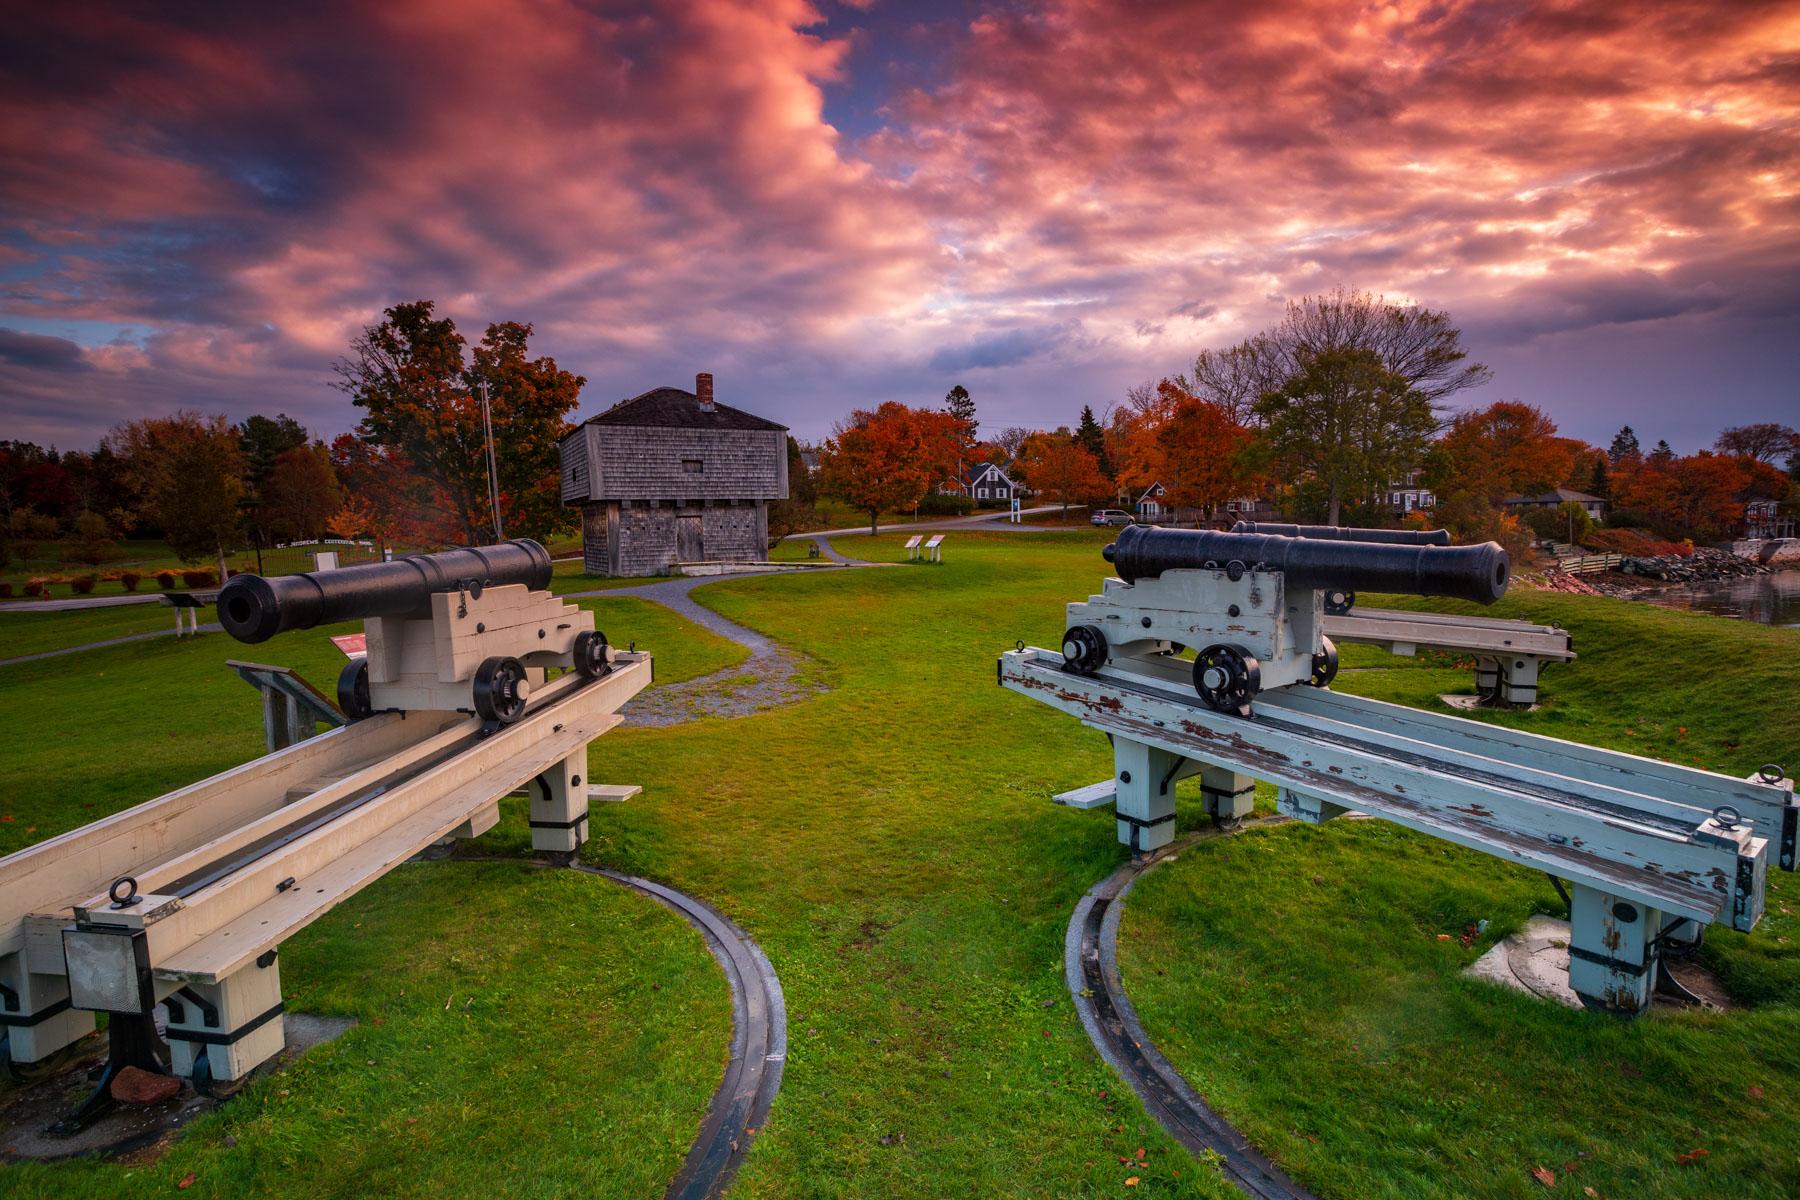 St Andrews Blockhouse looking back sunrise, New Brunswick, Canada